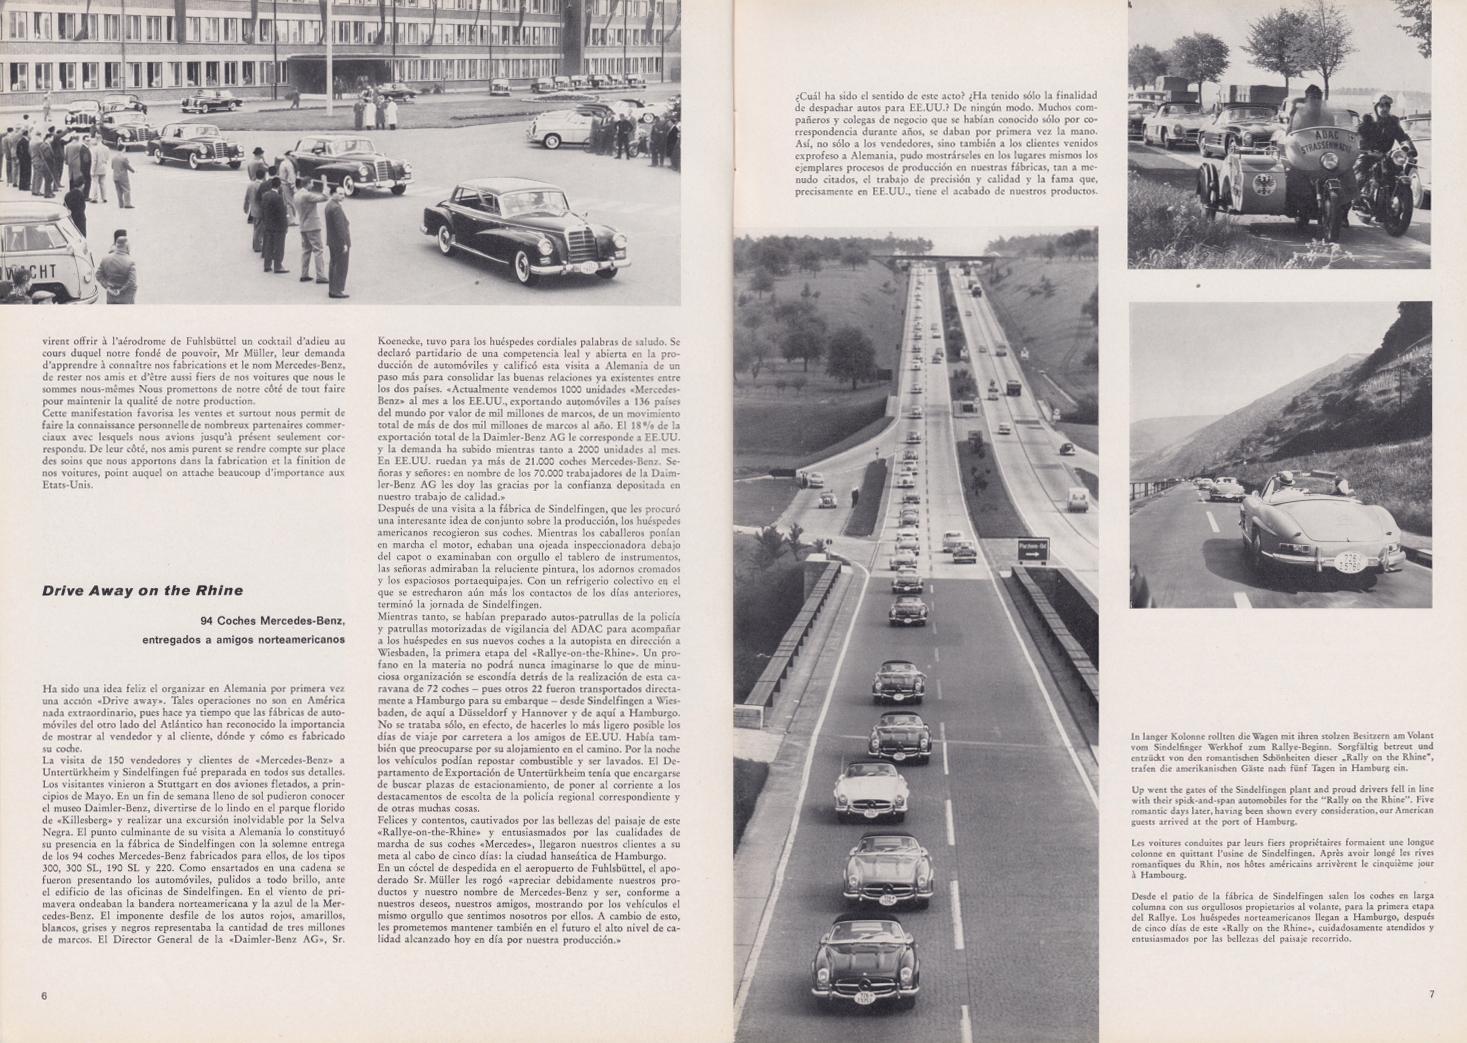 (REVISTA): Periódico In aller welt n.º 33 - Mercedes-Benz no mundo - 1959 - multilingue 004